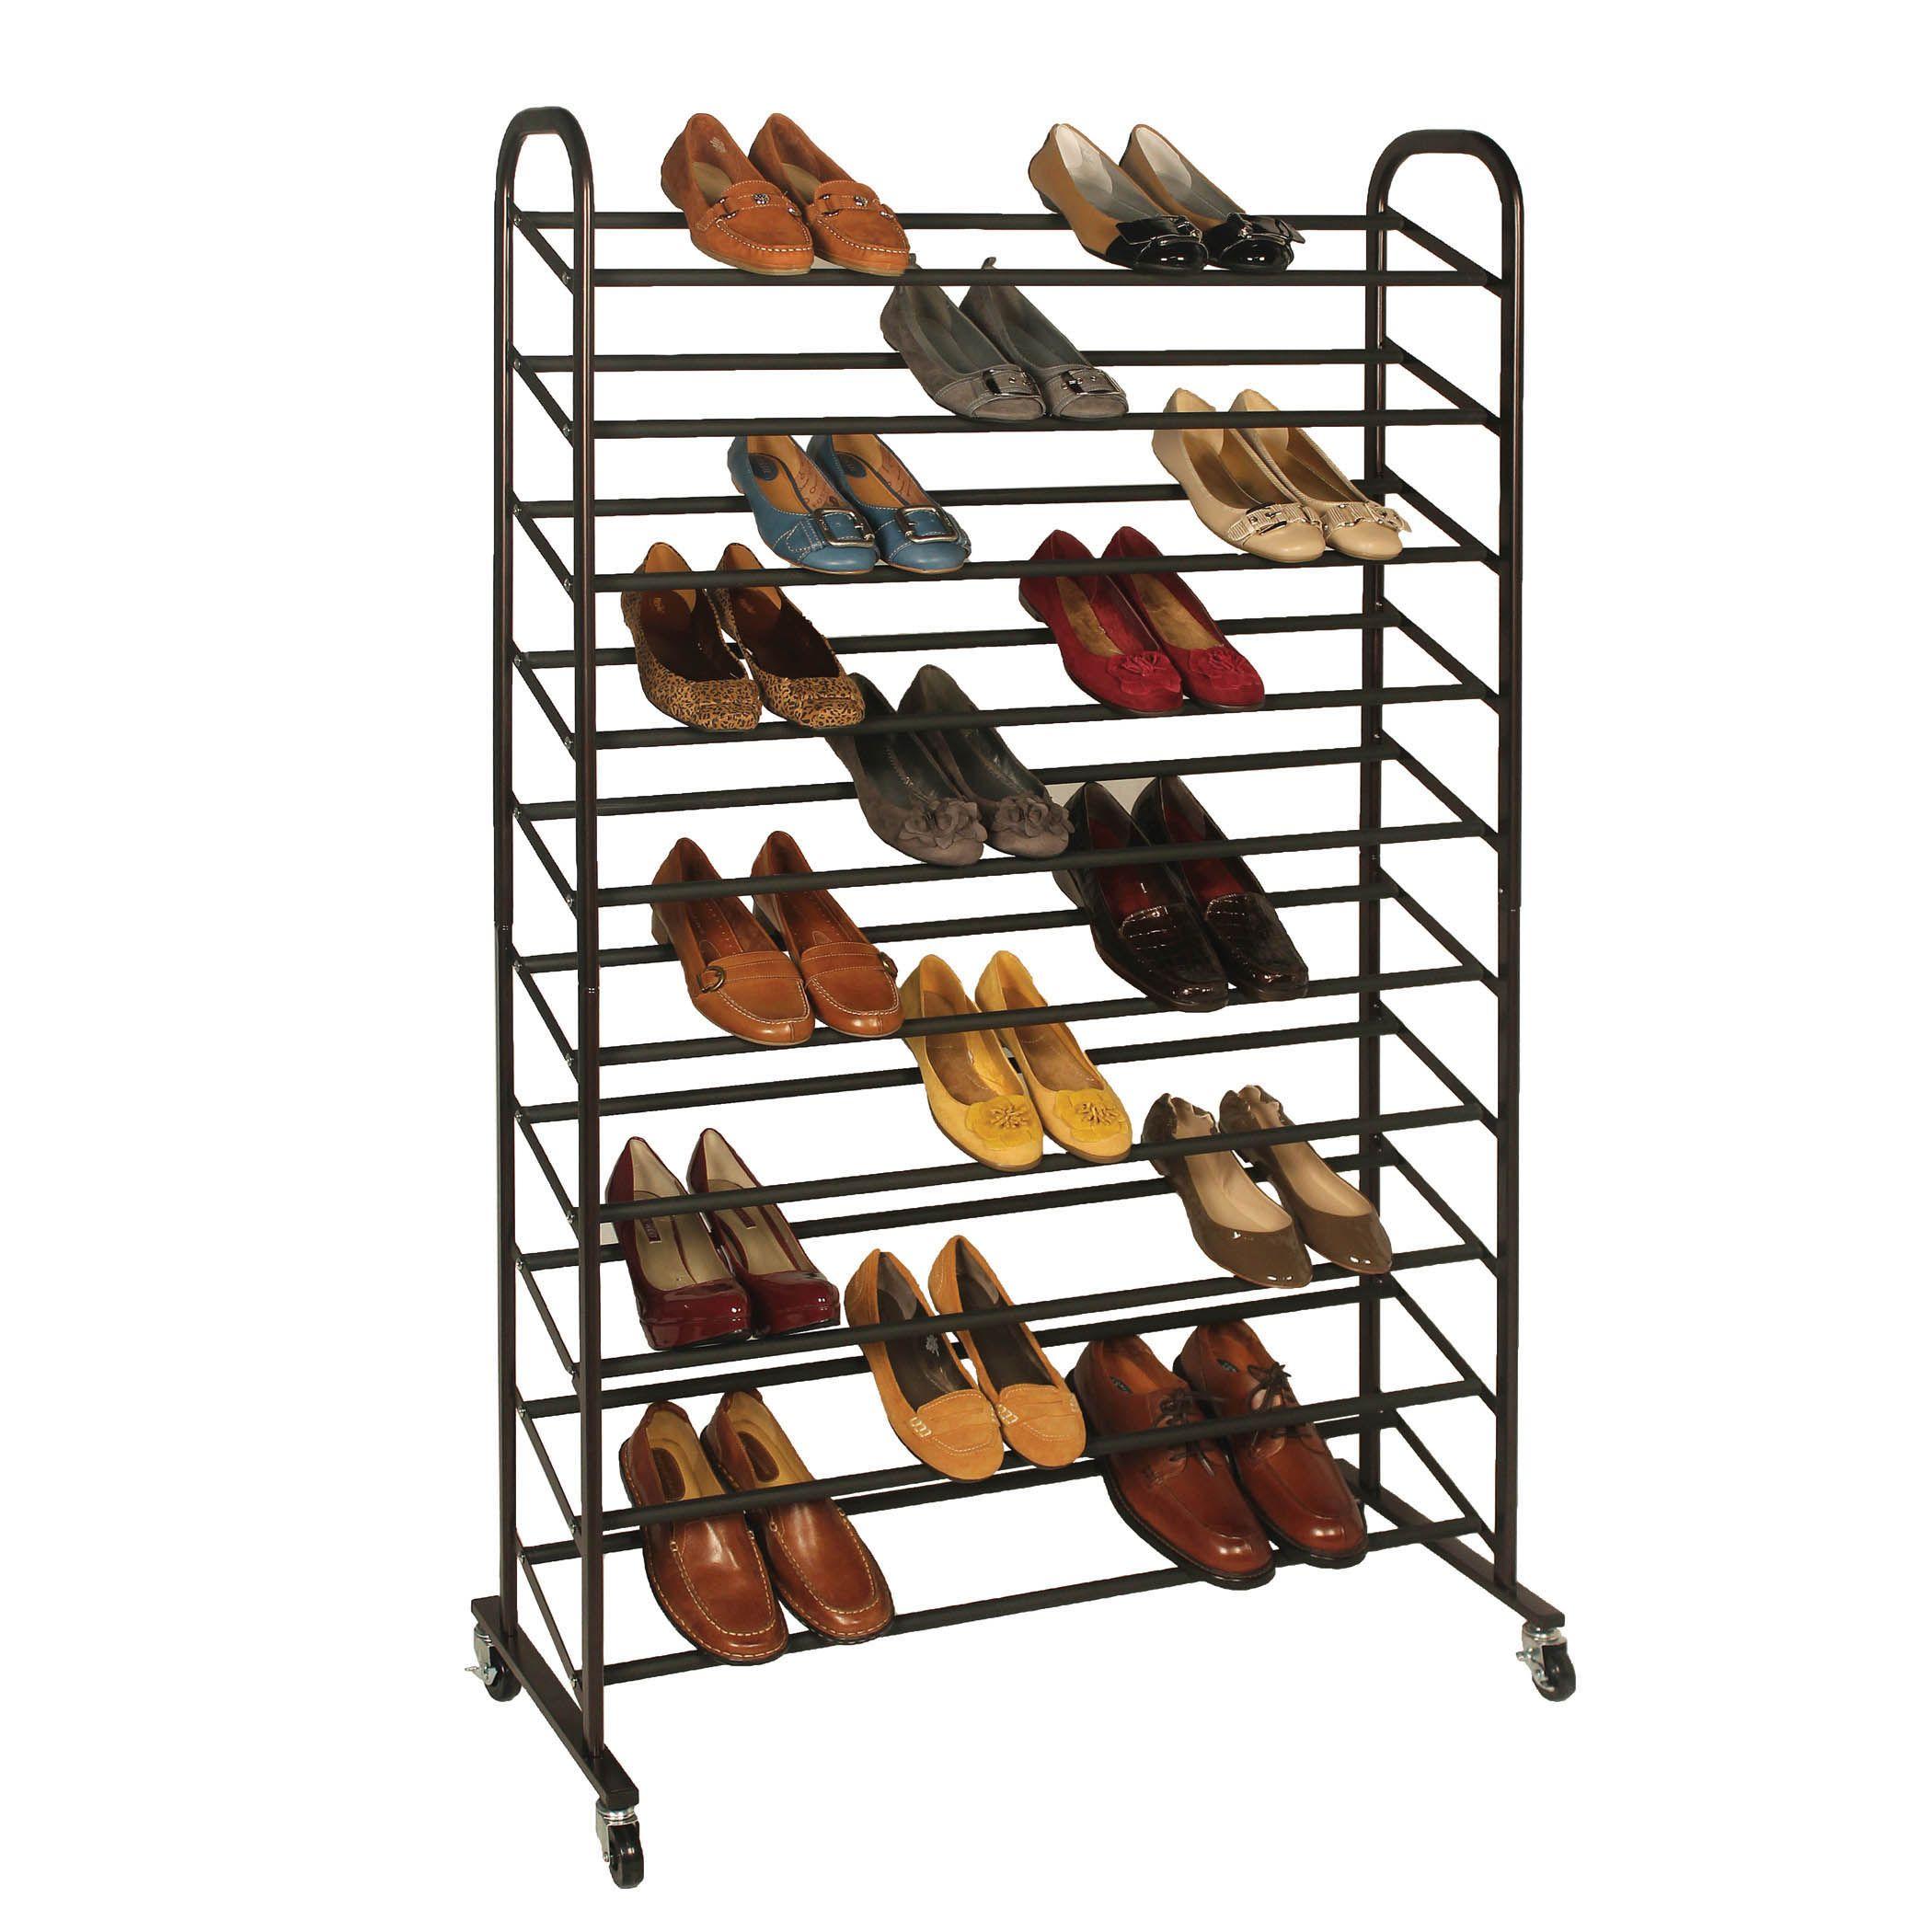 Richards Homewares Rolling 50 Pair Shoe Rack This Durable 10 Tiered Rack